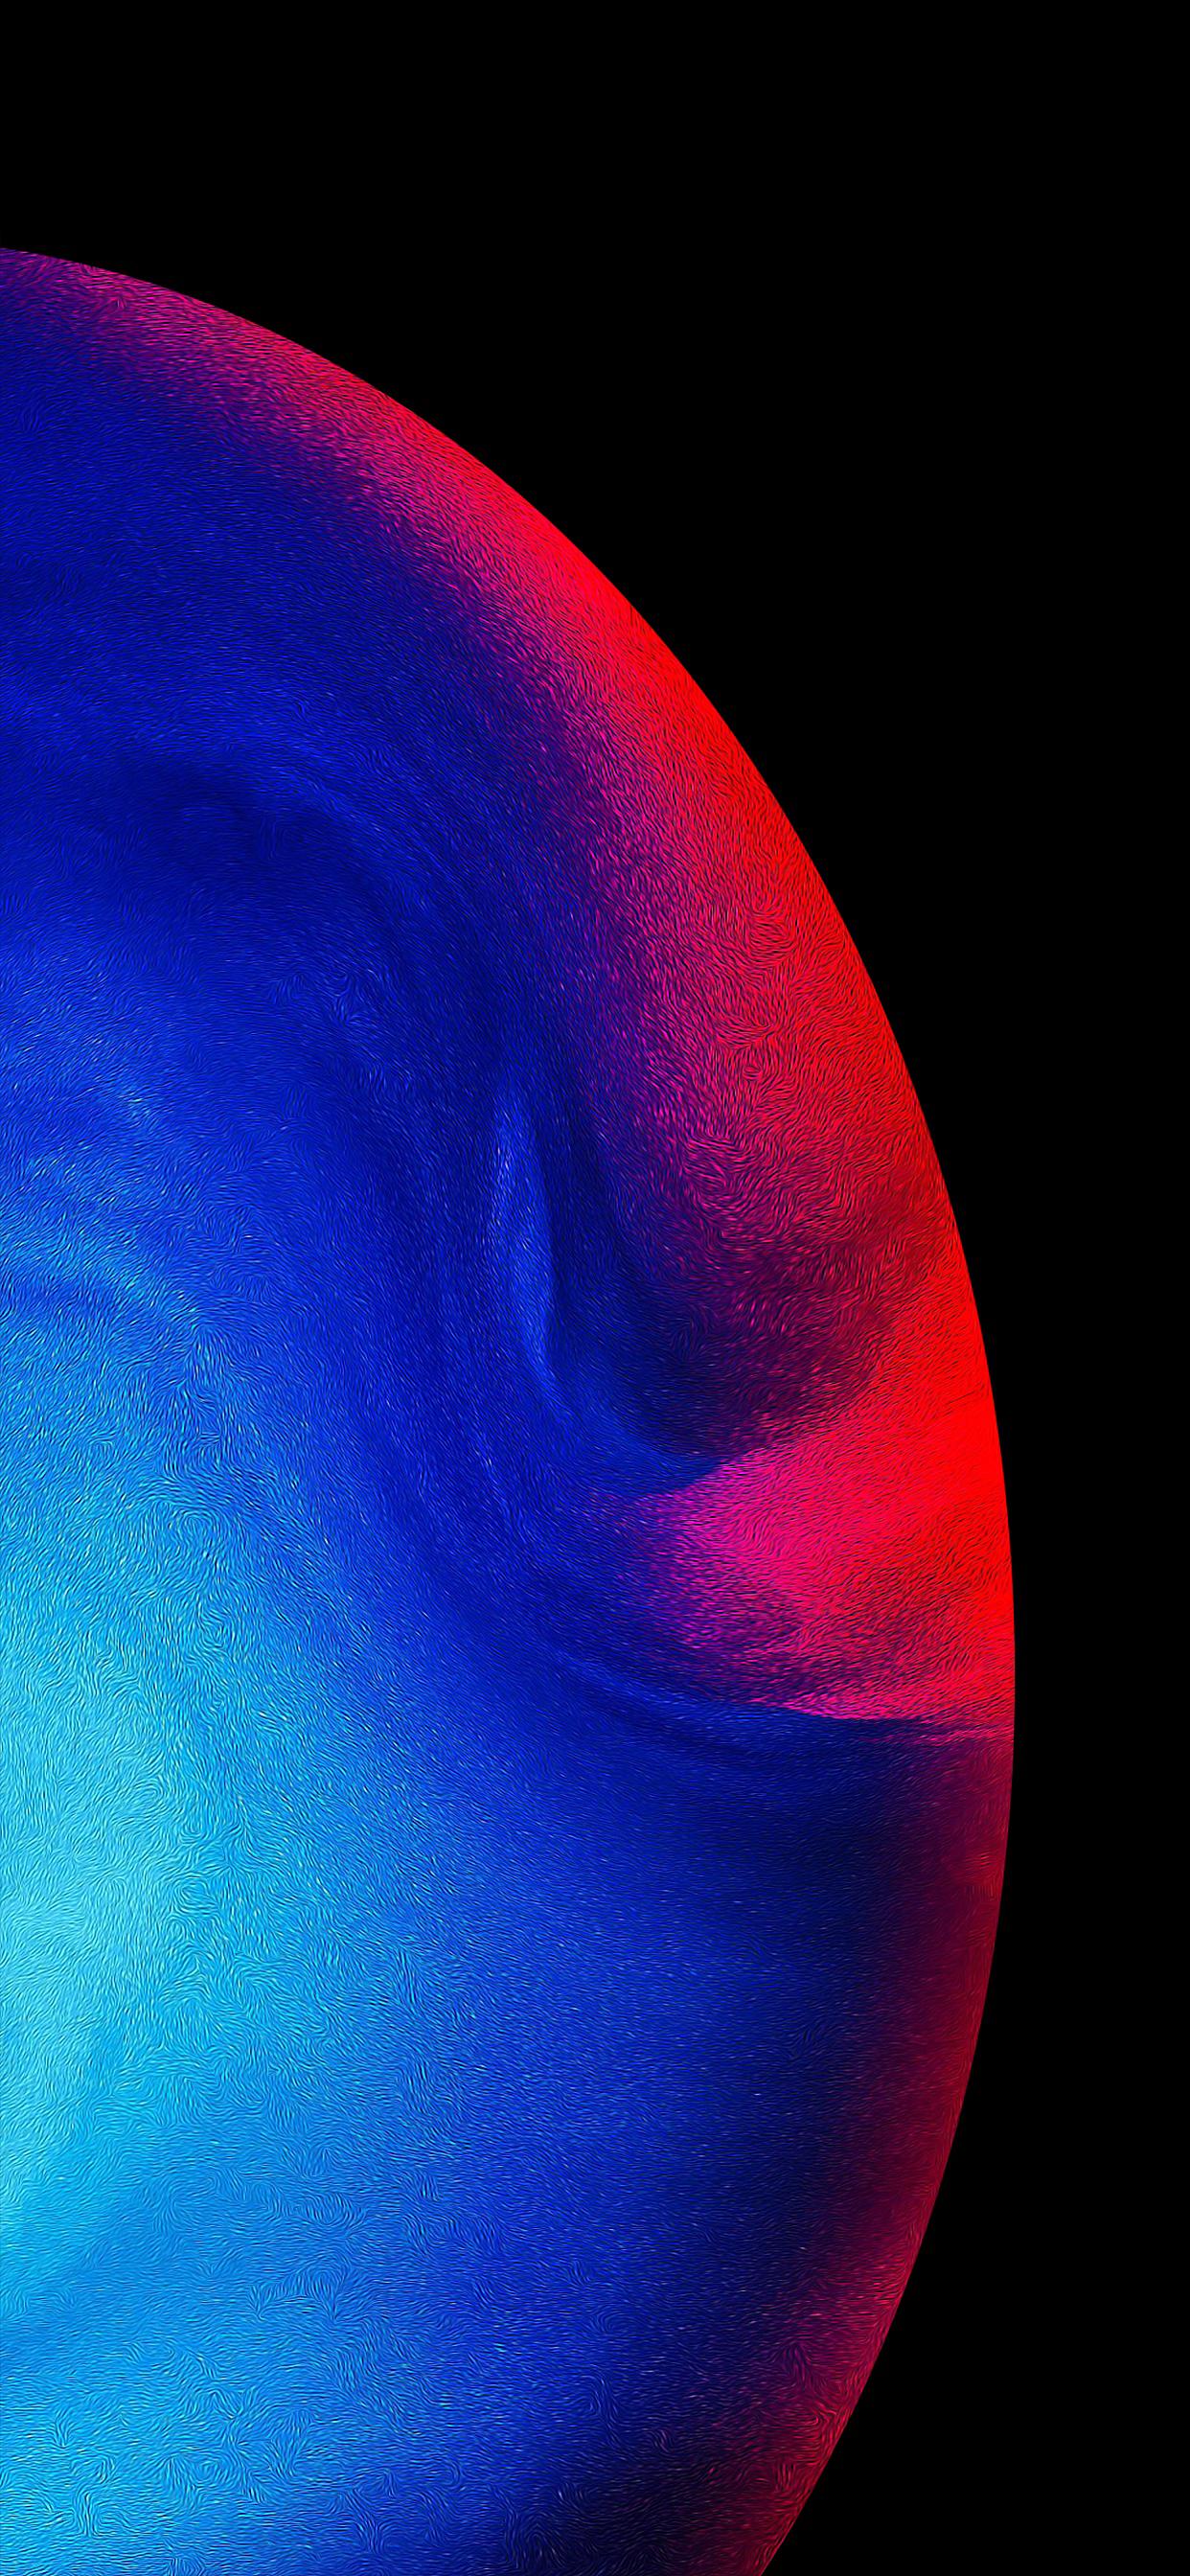 iPhone wallpaper neptune moon 1 Fonds d'écran iPhone du 28/02/2019